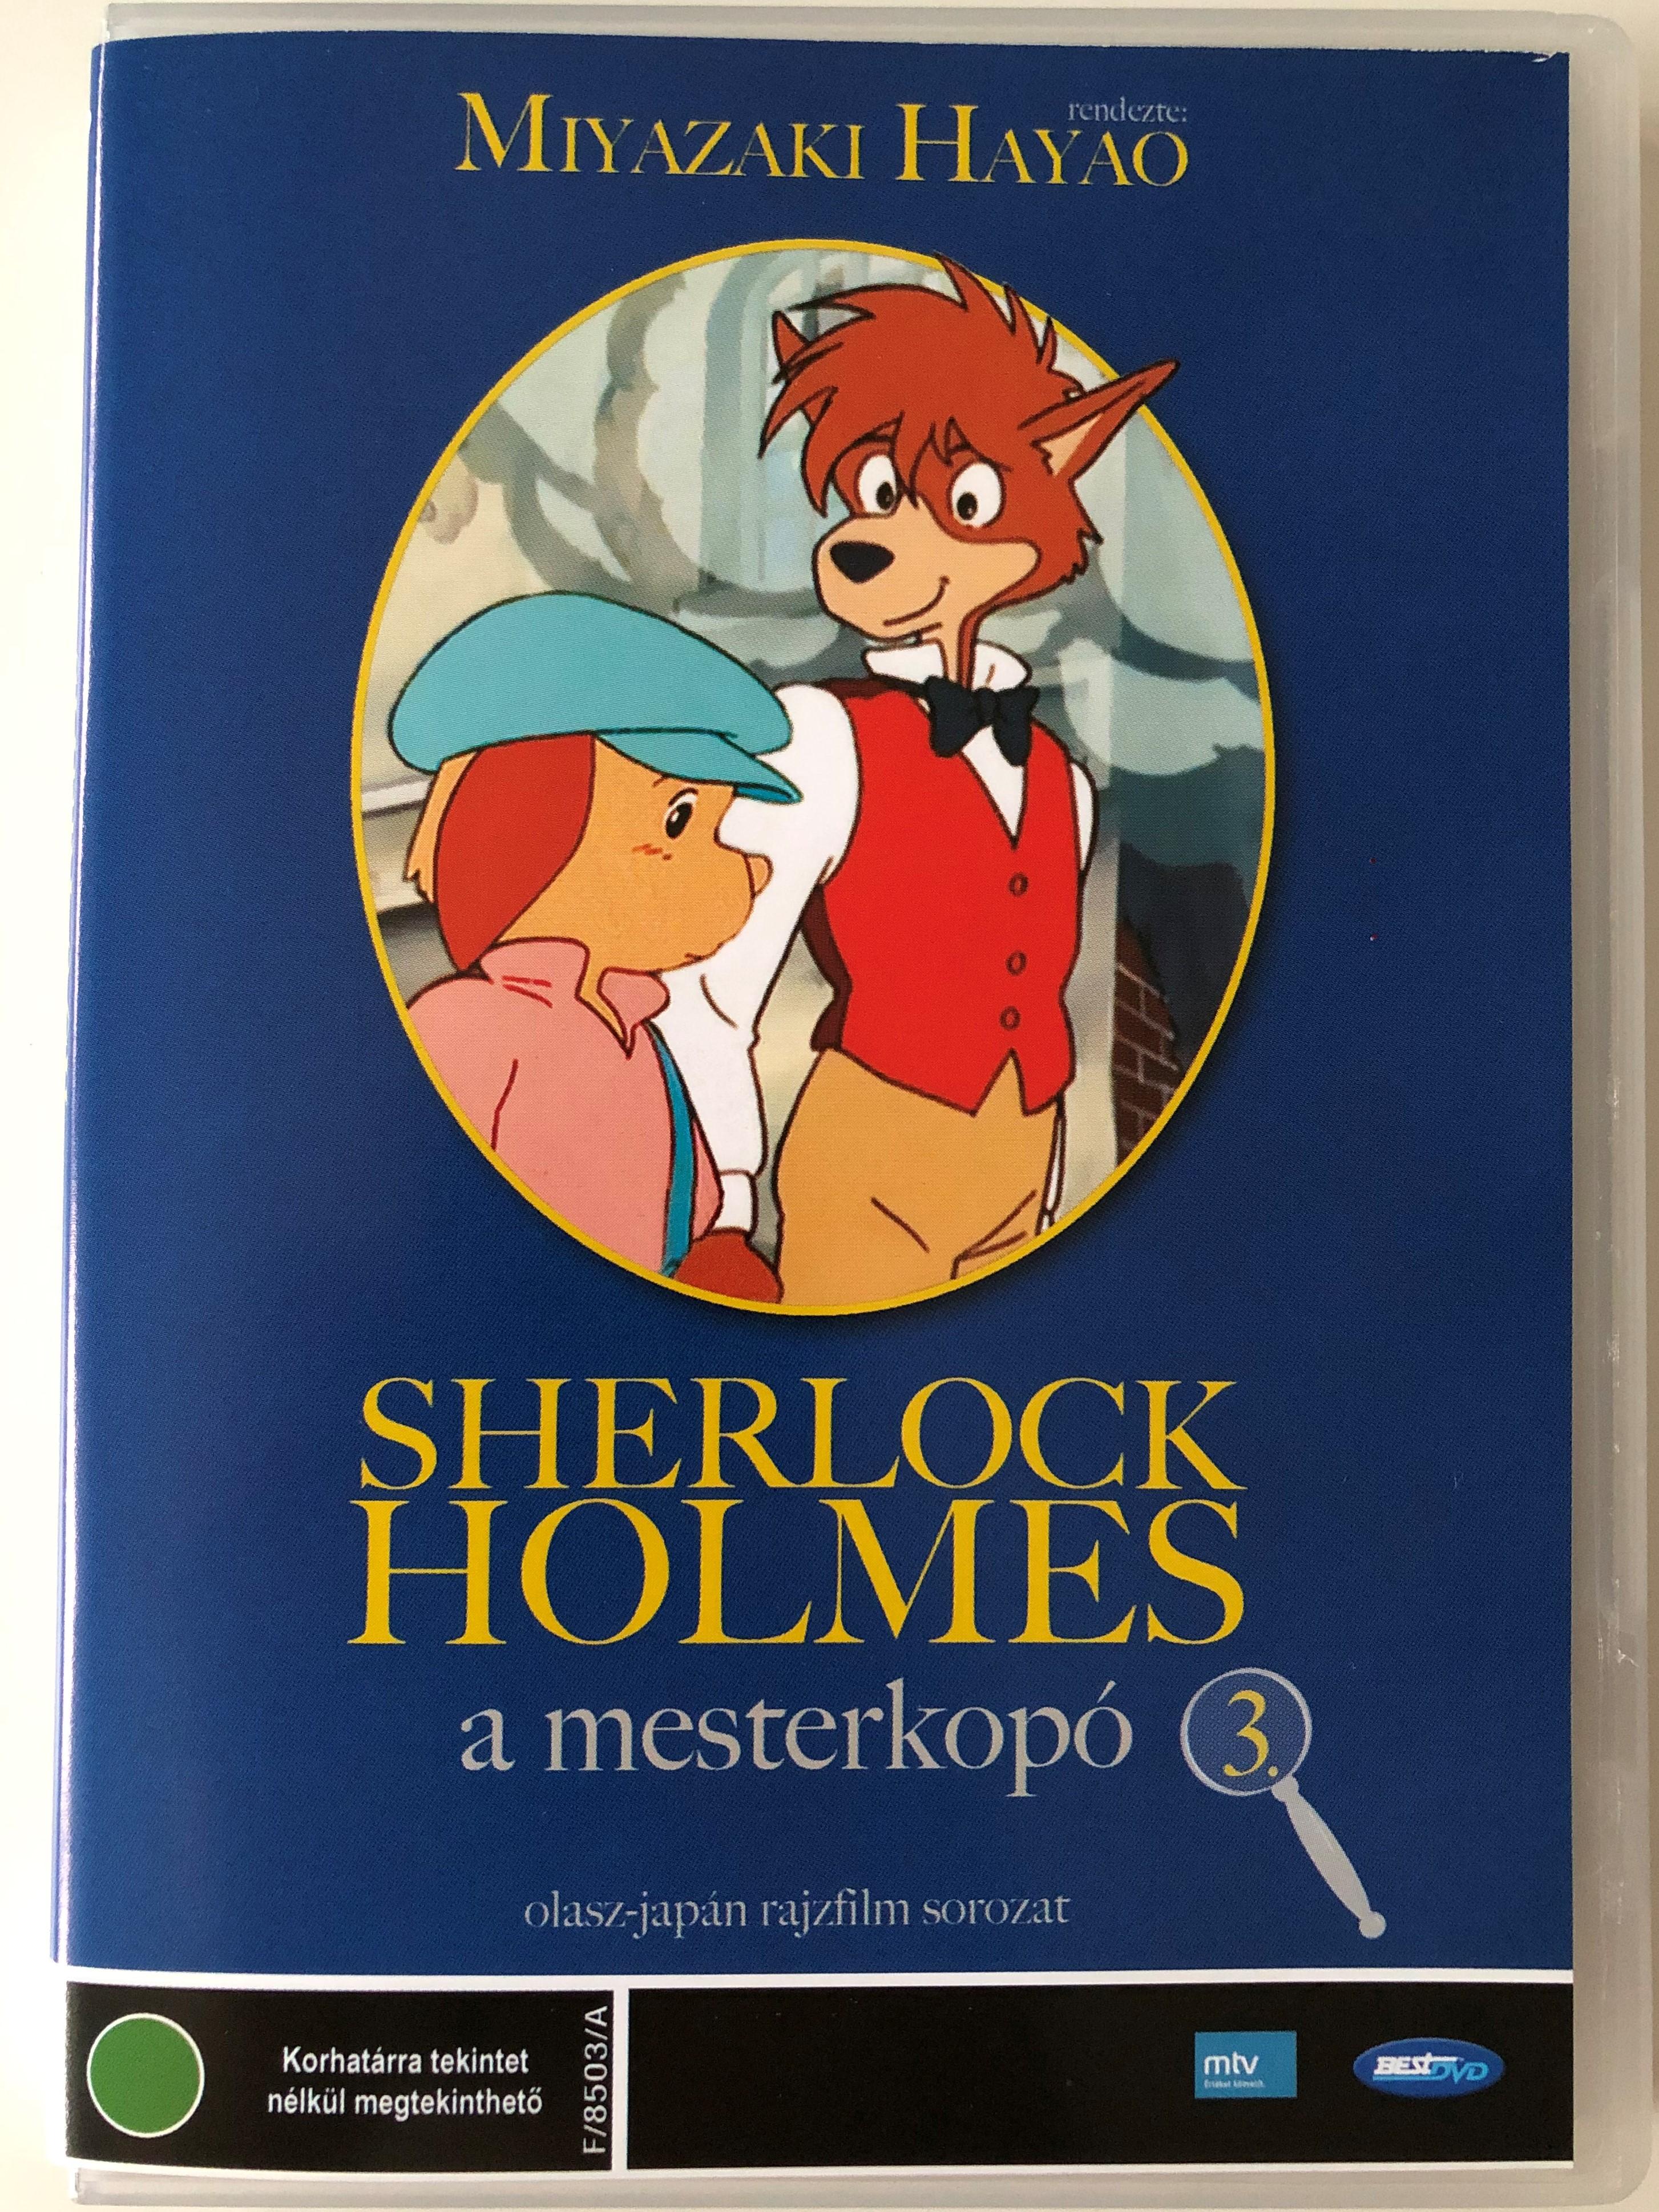 fiuto-di-sherlock-holmes-3.-dvd-1984-sherlock-holmes-a-mesterkop-1.jpg